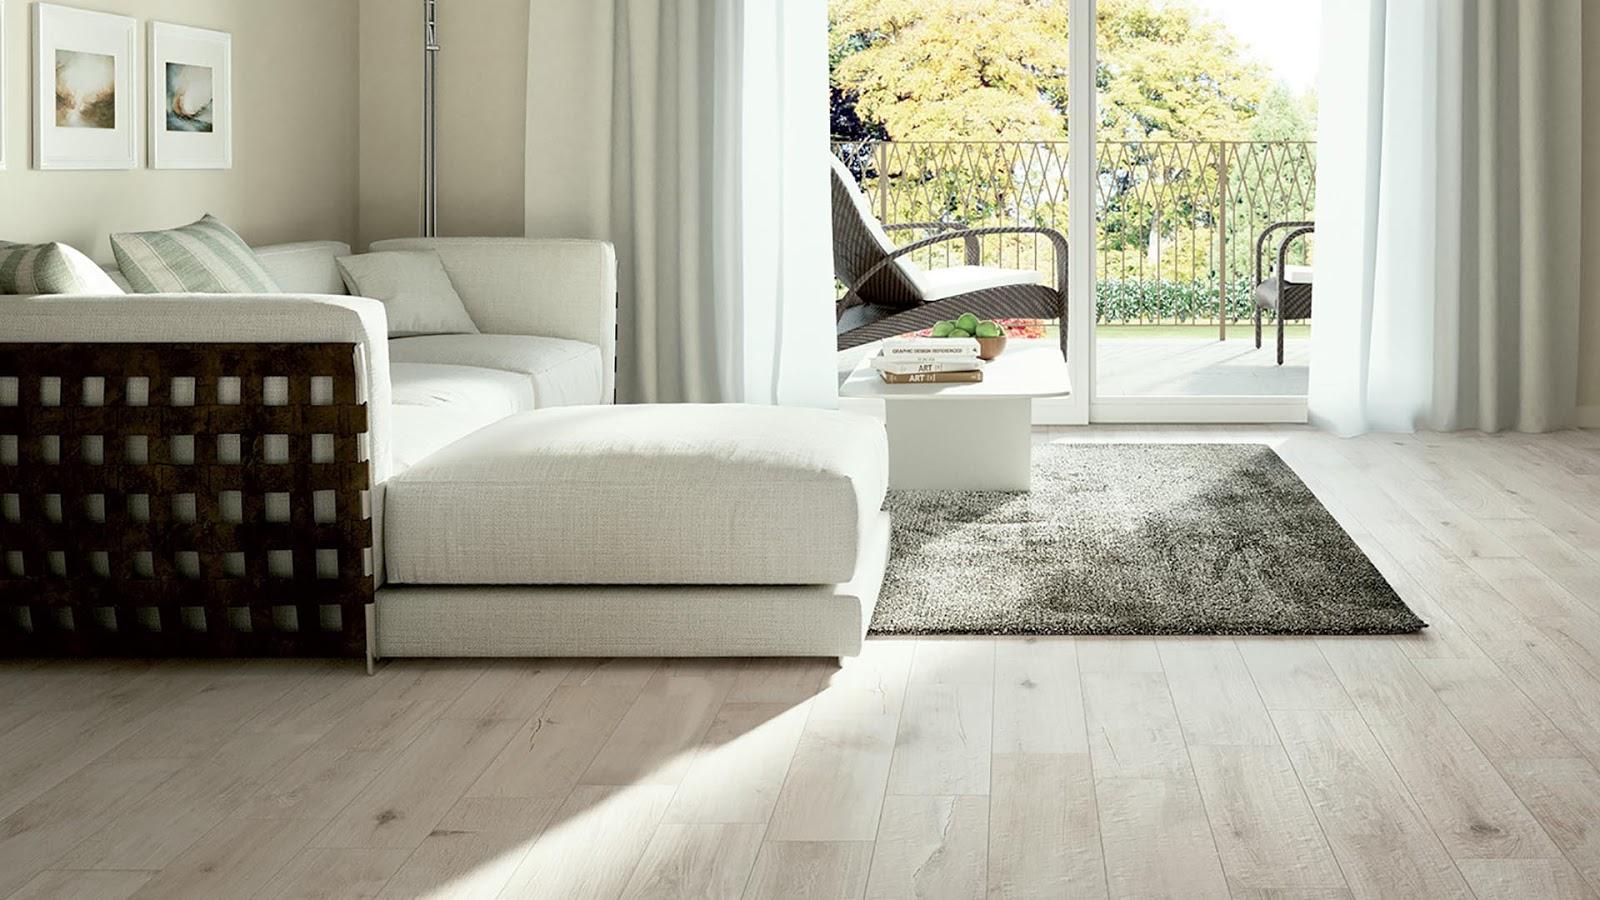 Italian Porcelain Tile Of Ceramica Artistica Due Floor Wall Tiles Design Ideas